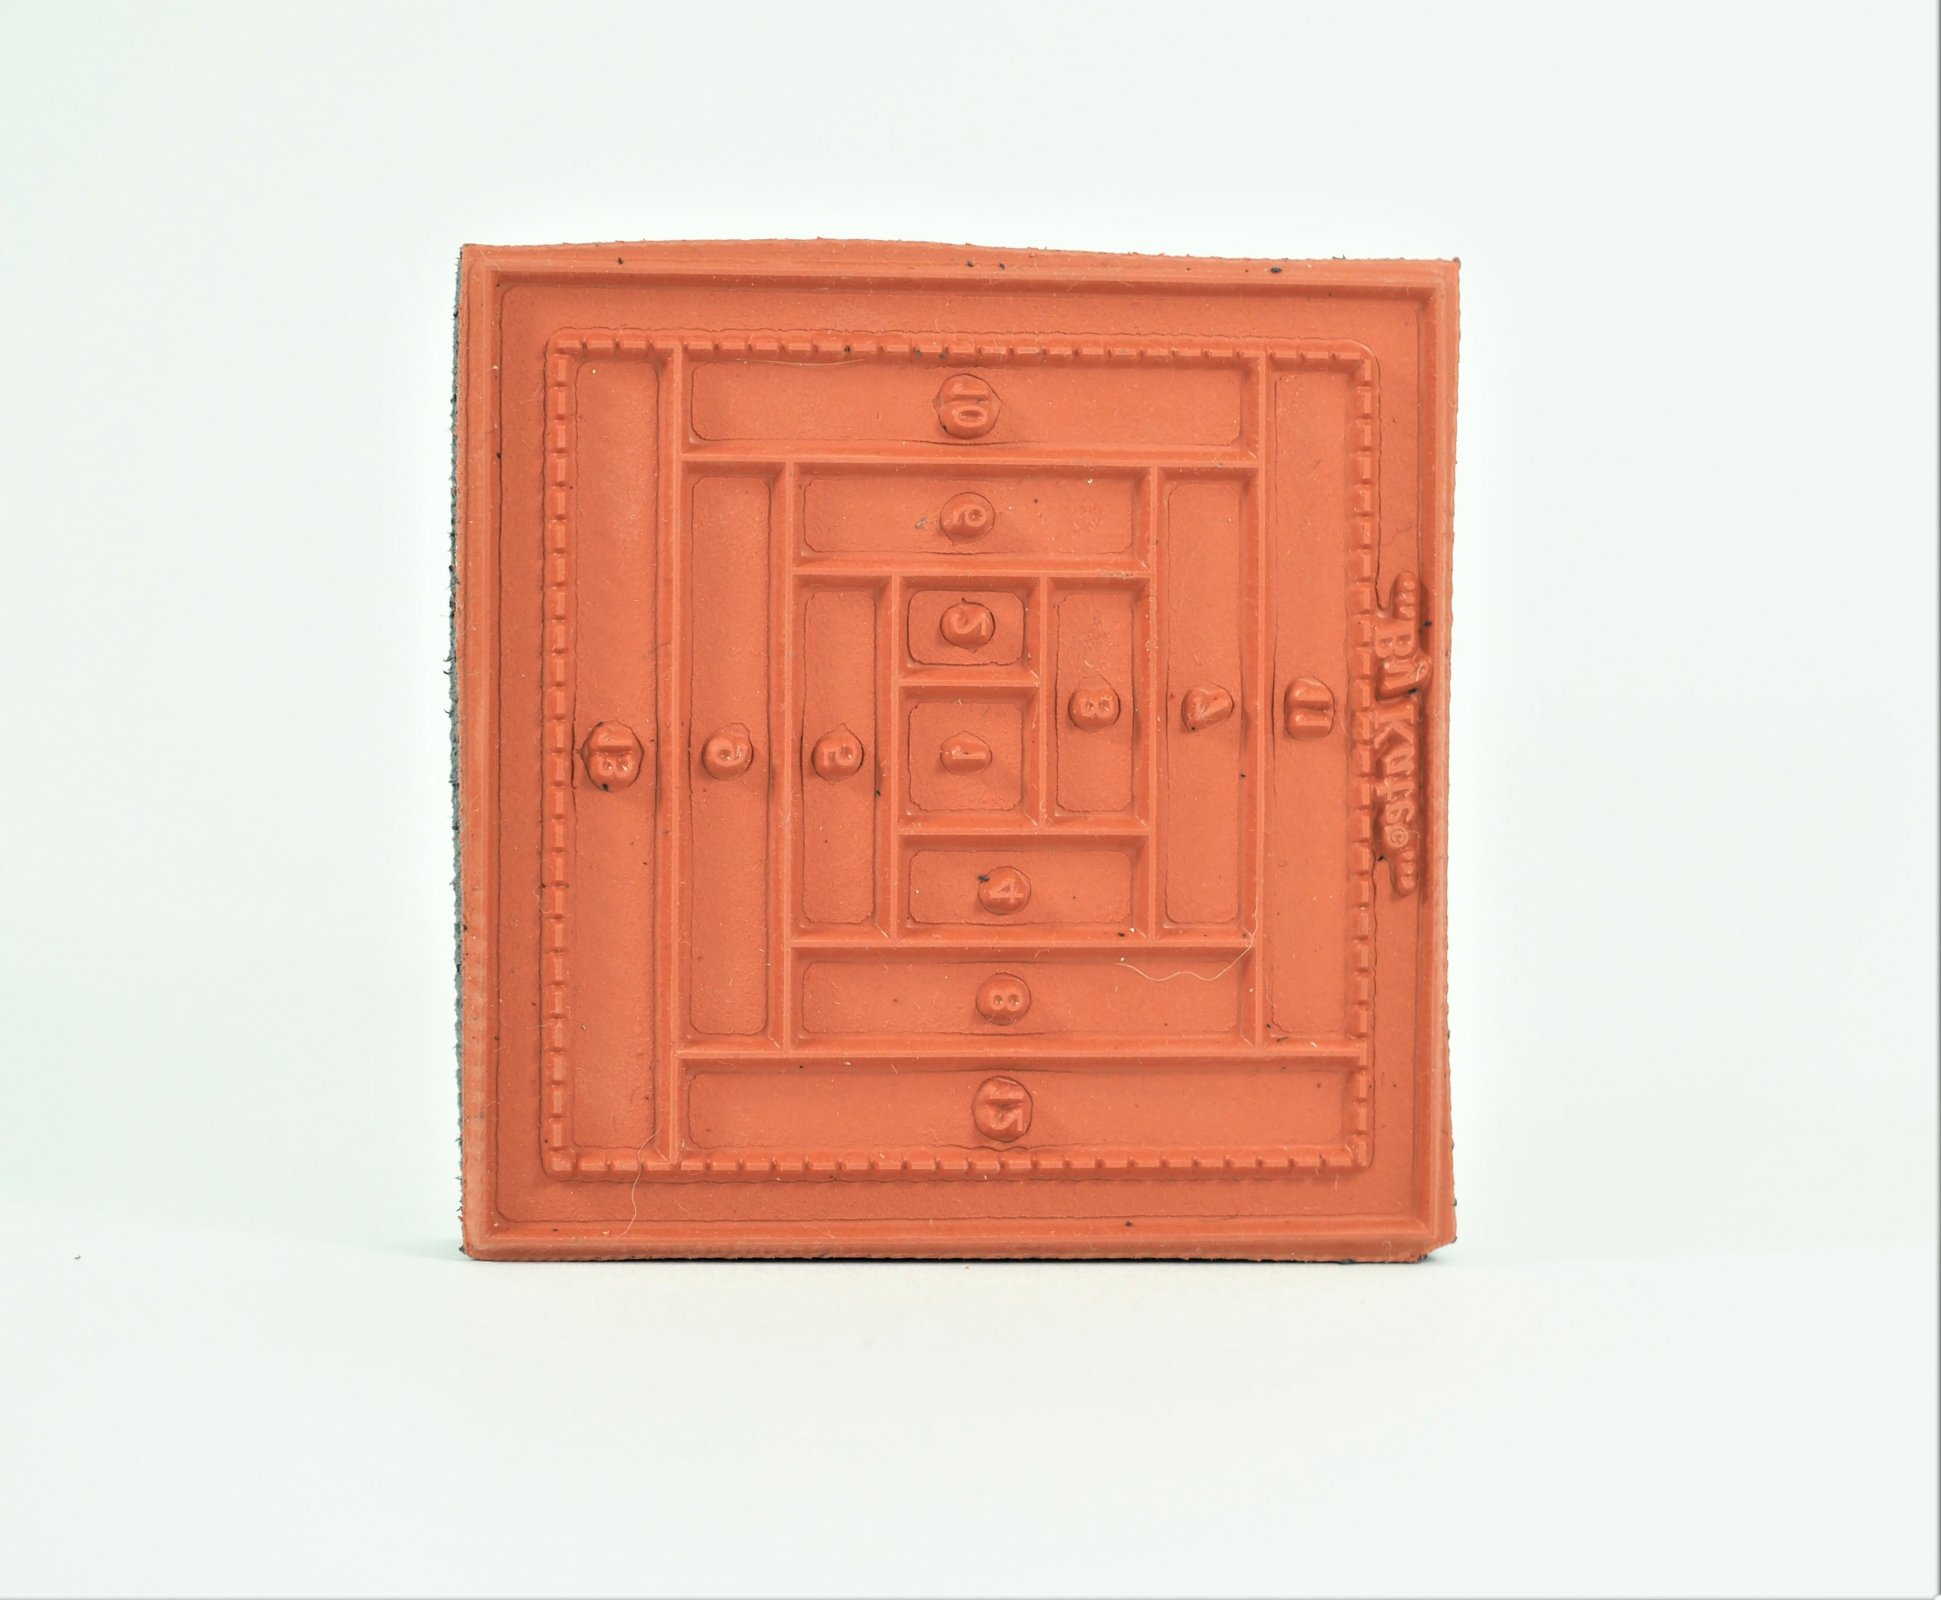 Log Cabin Stamp - 3-1/2 inch